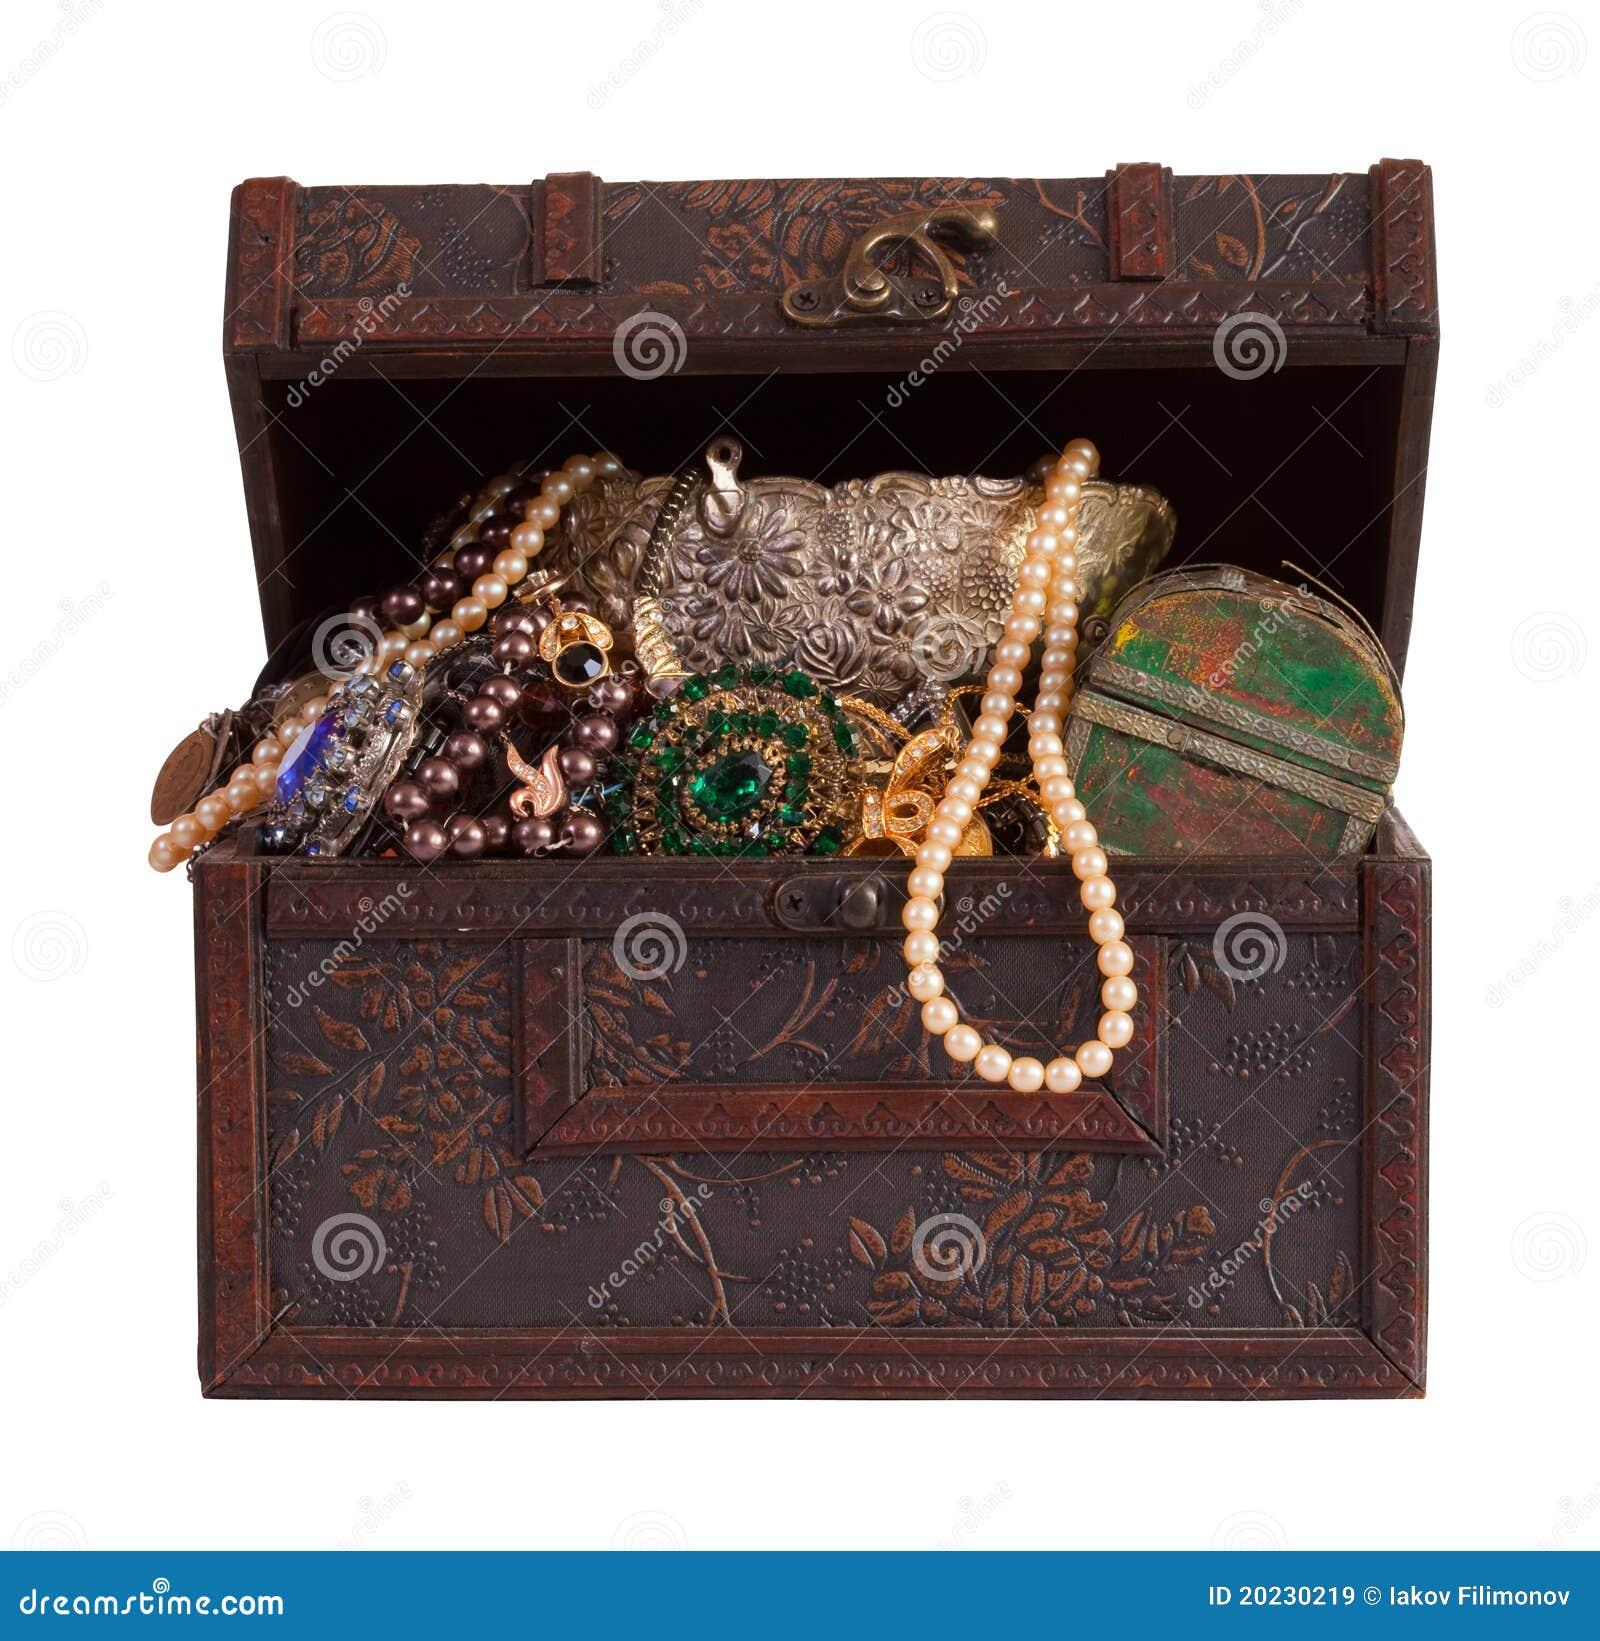 Treasure chest with jewellery